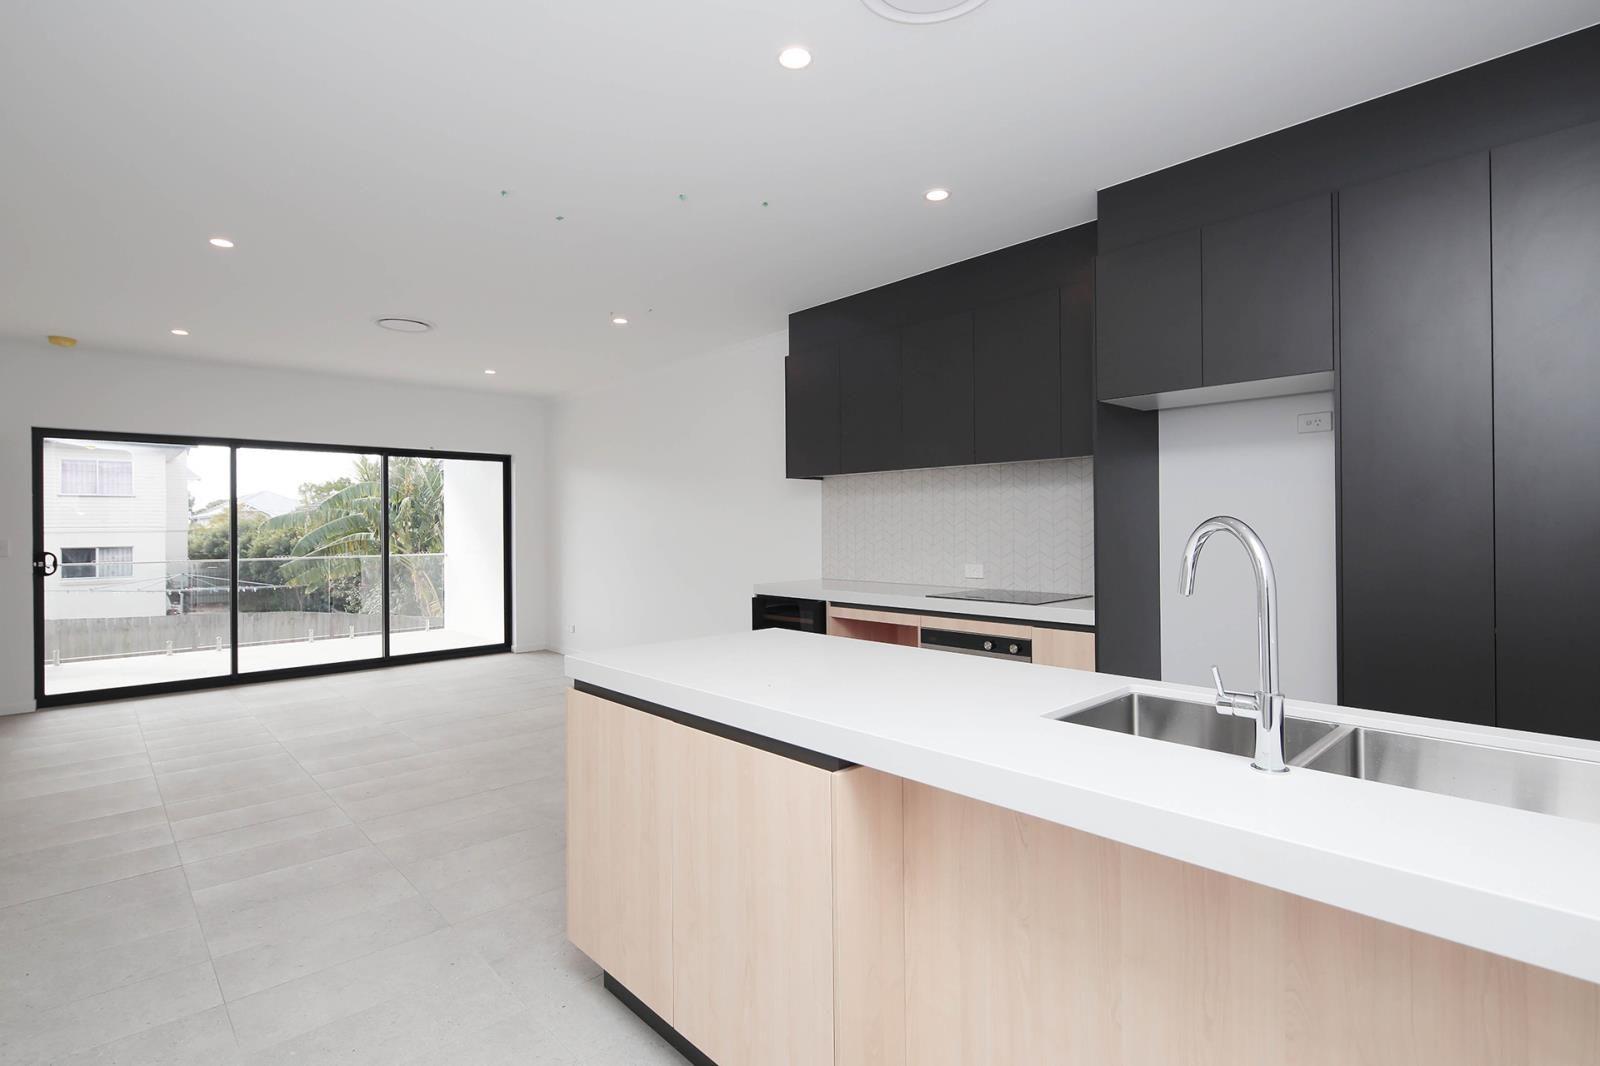 17/100 Monmouth Street, Morningside QLD 4170, Image 2